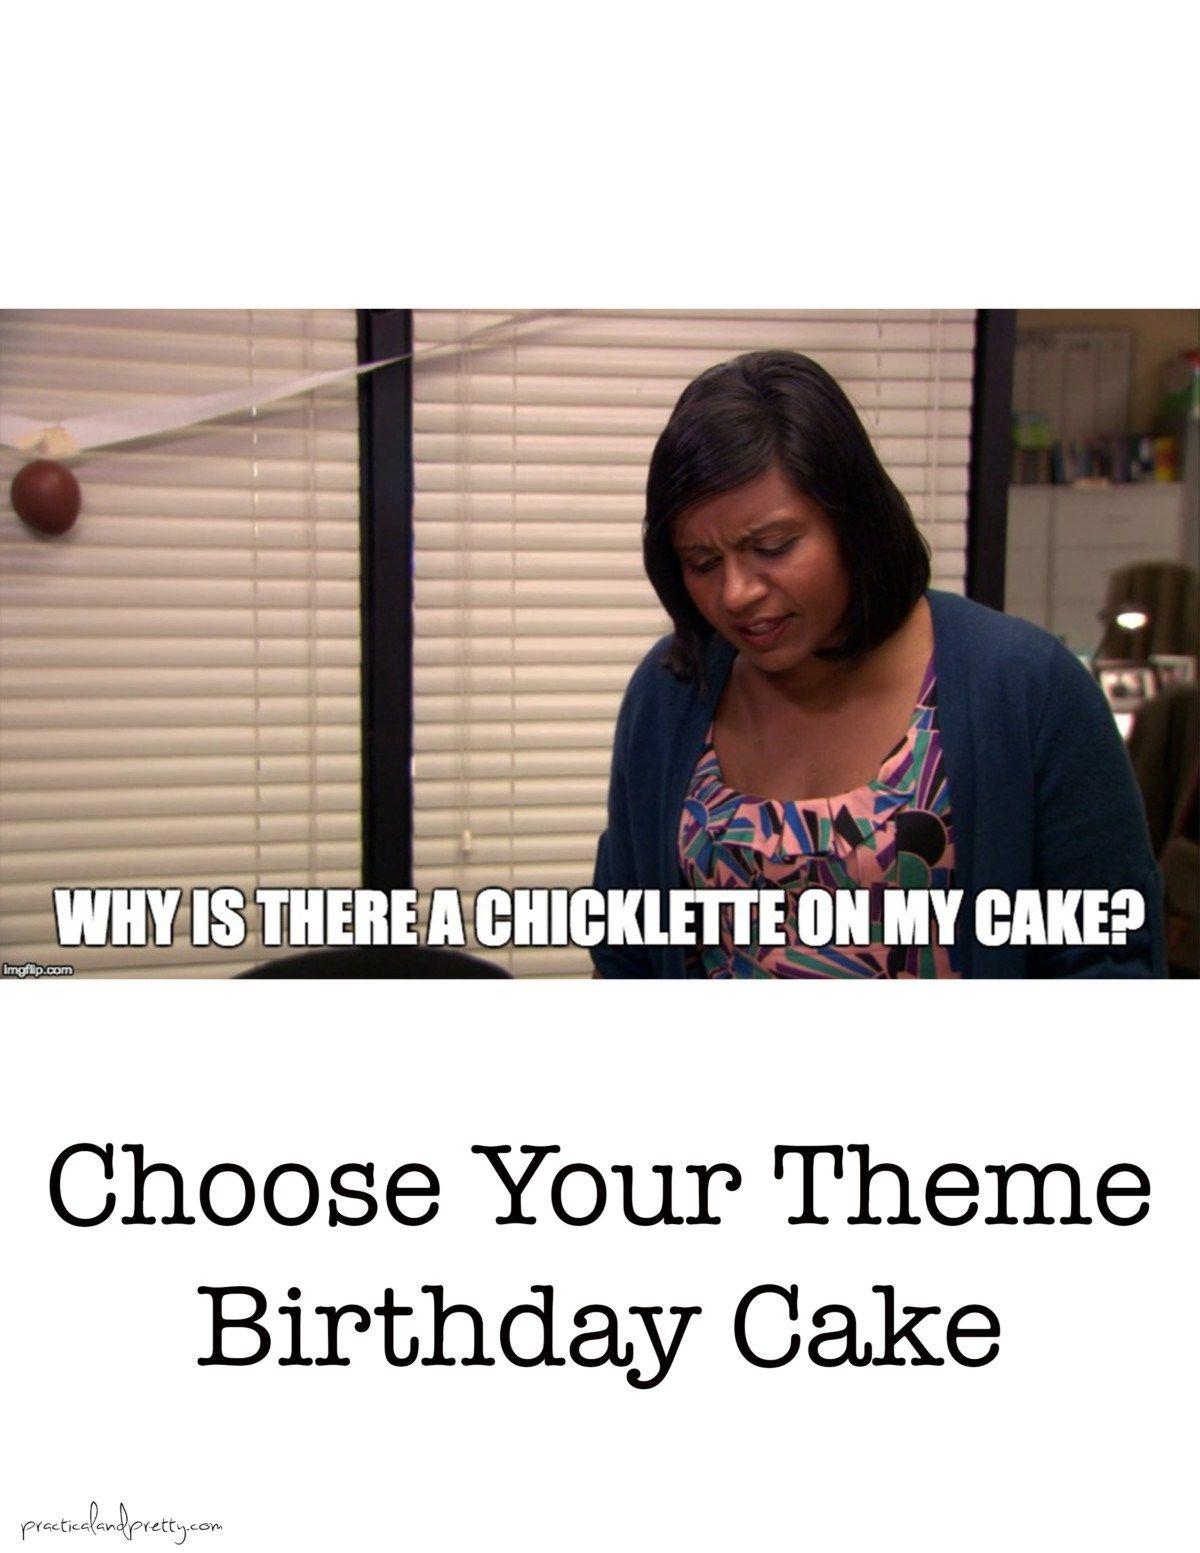 Funny Office Birthday Memes : funny, office, birthday, memes, Office, Birthday, Themed, Memes, Practical, Pretty, Party,, Happy, Birthday,, Party